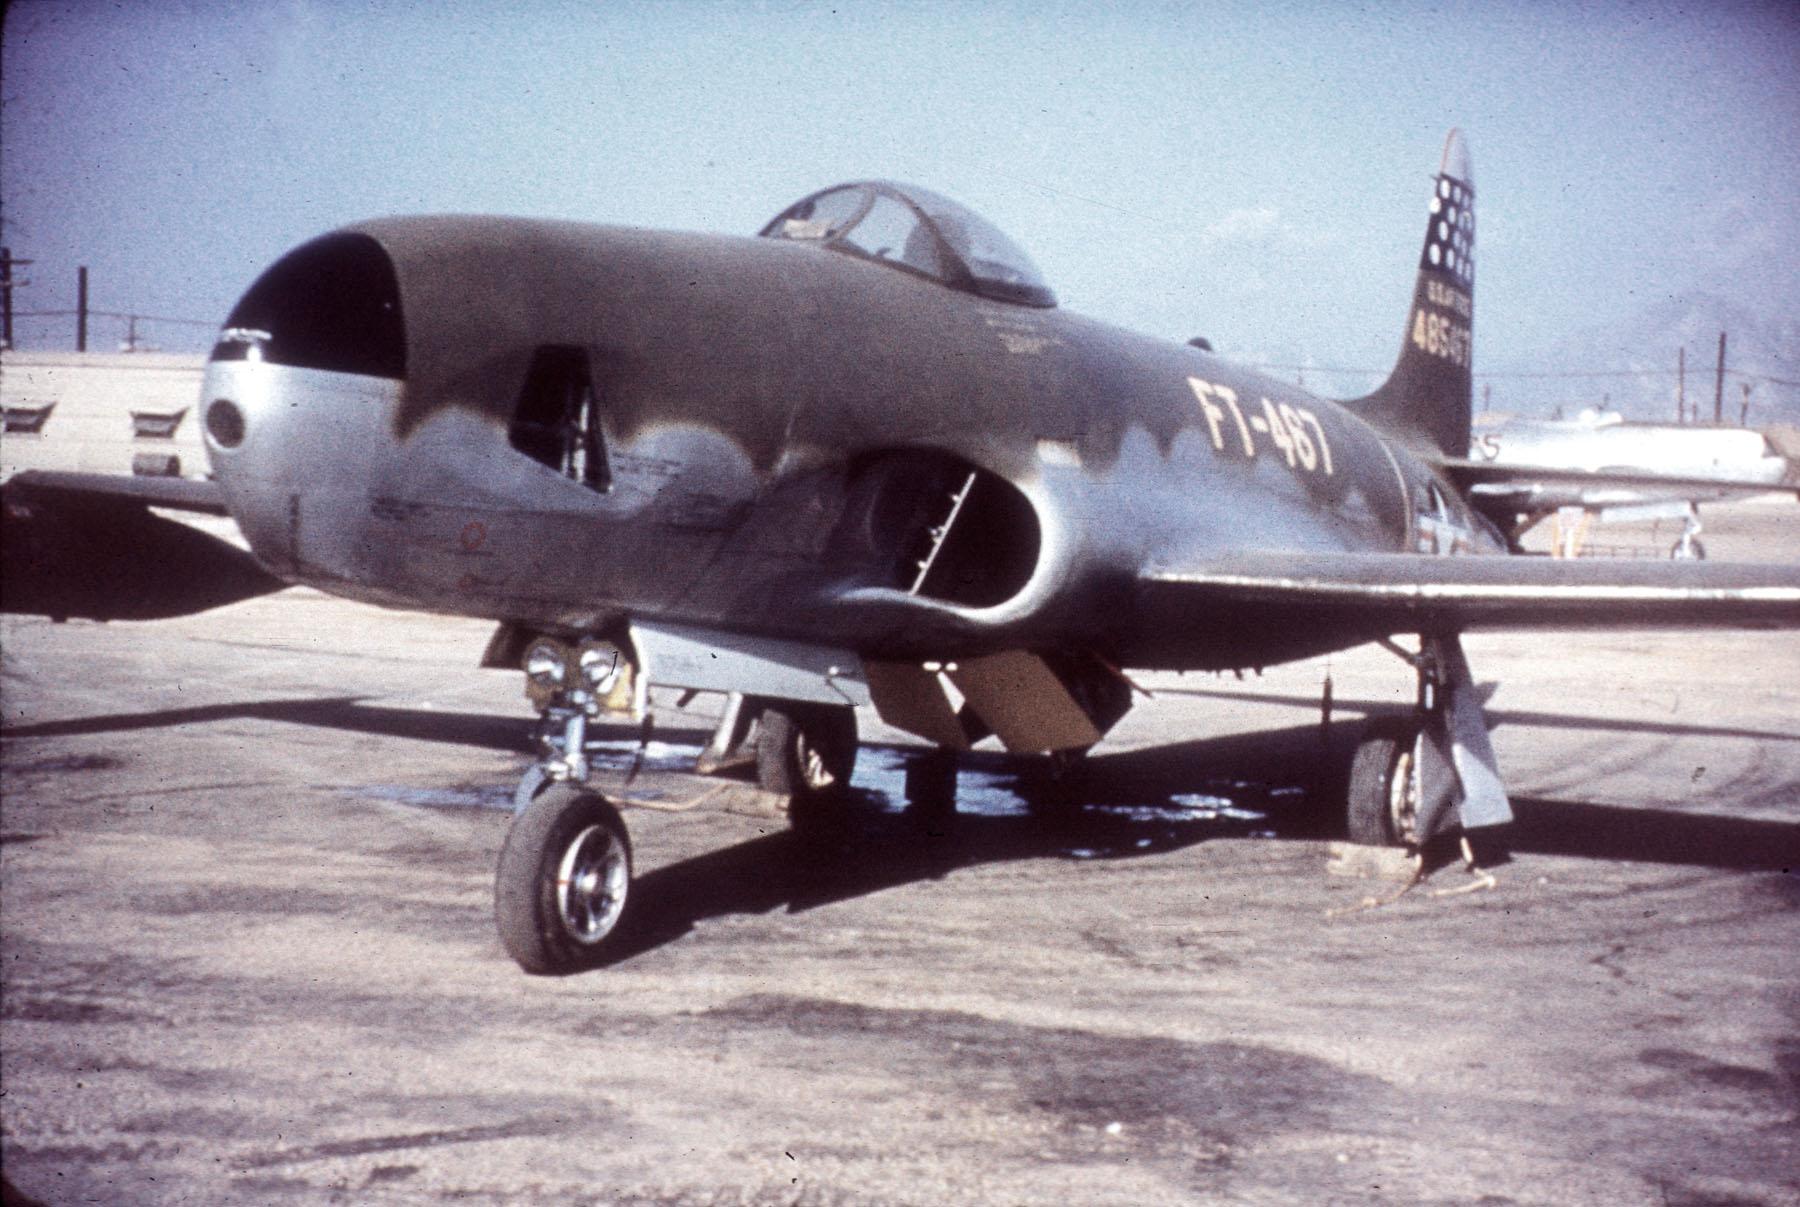 Rf A Th Trs In Korea on Lockheed P 80